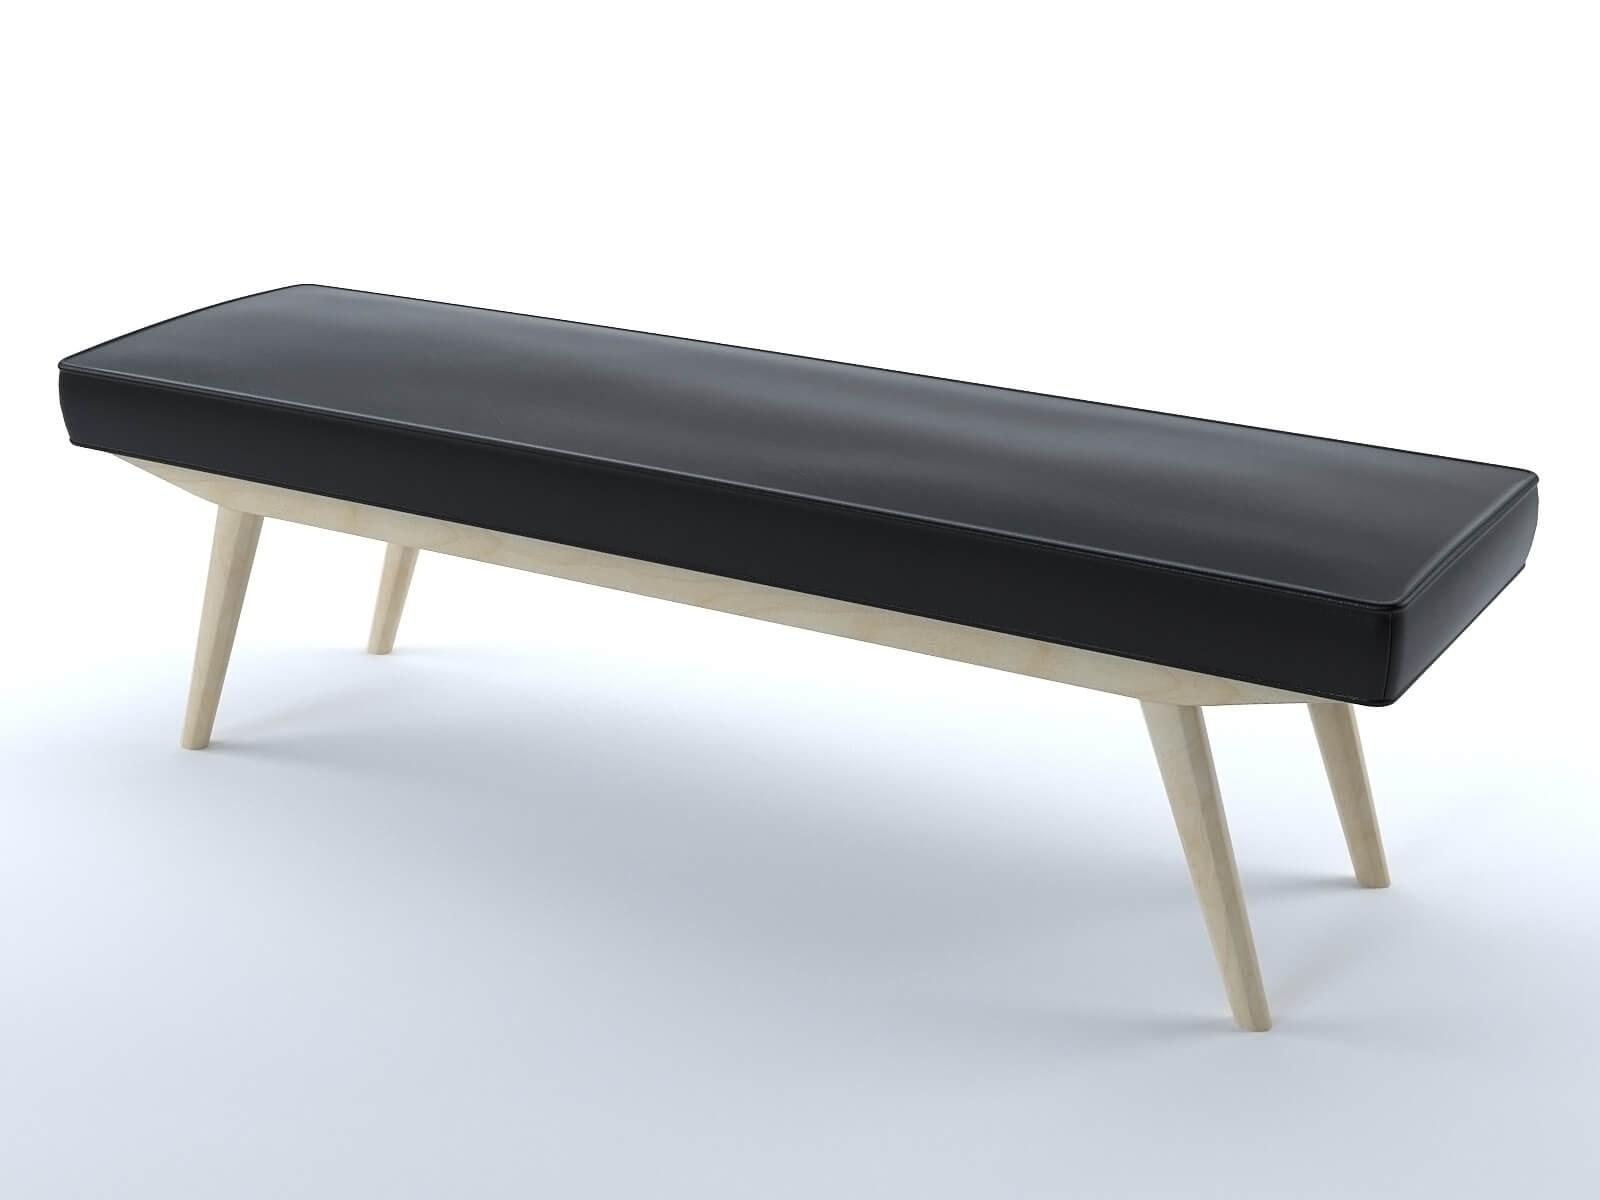 Aveiro bench